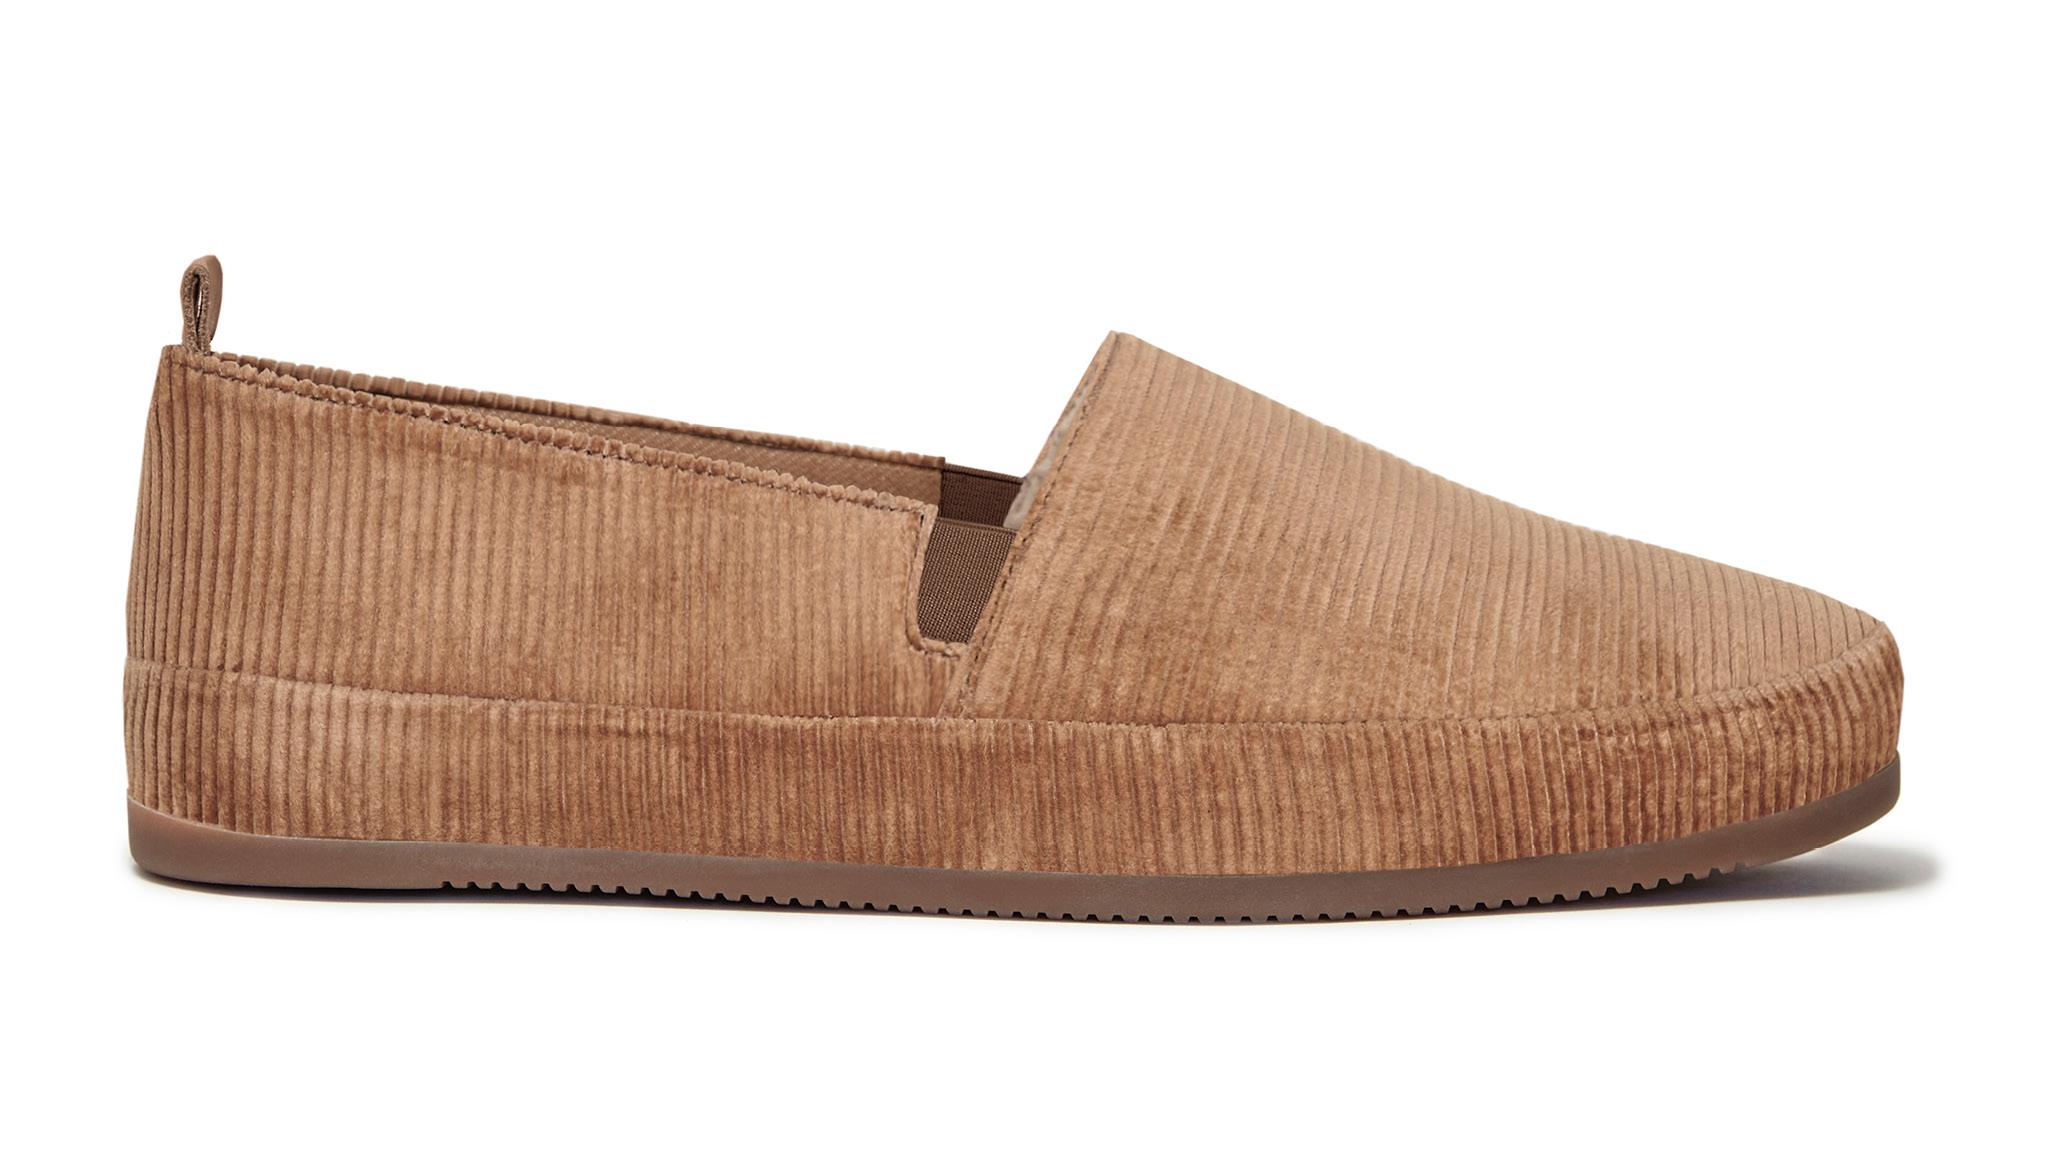 Slippers for Men in Camel Corduroy